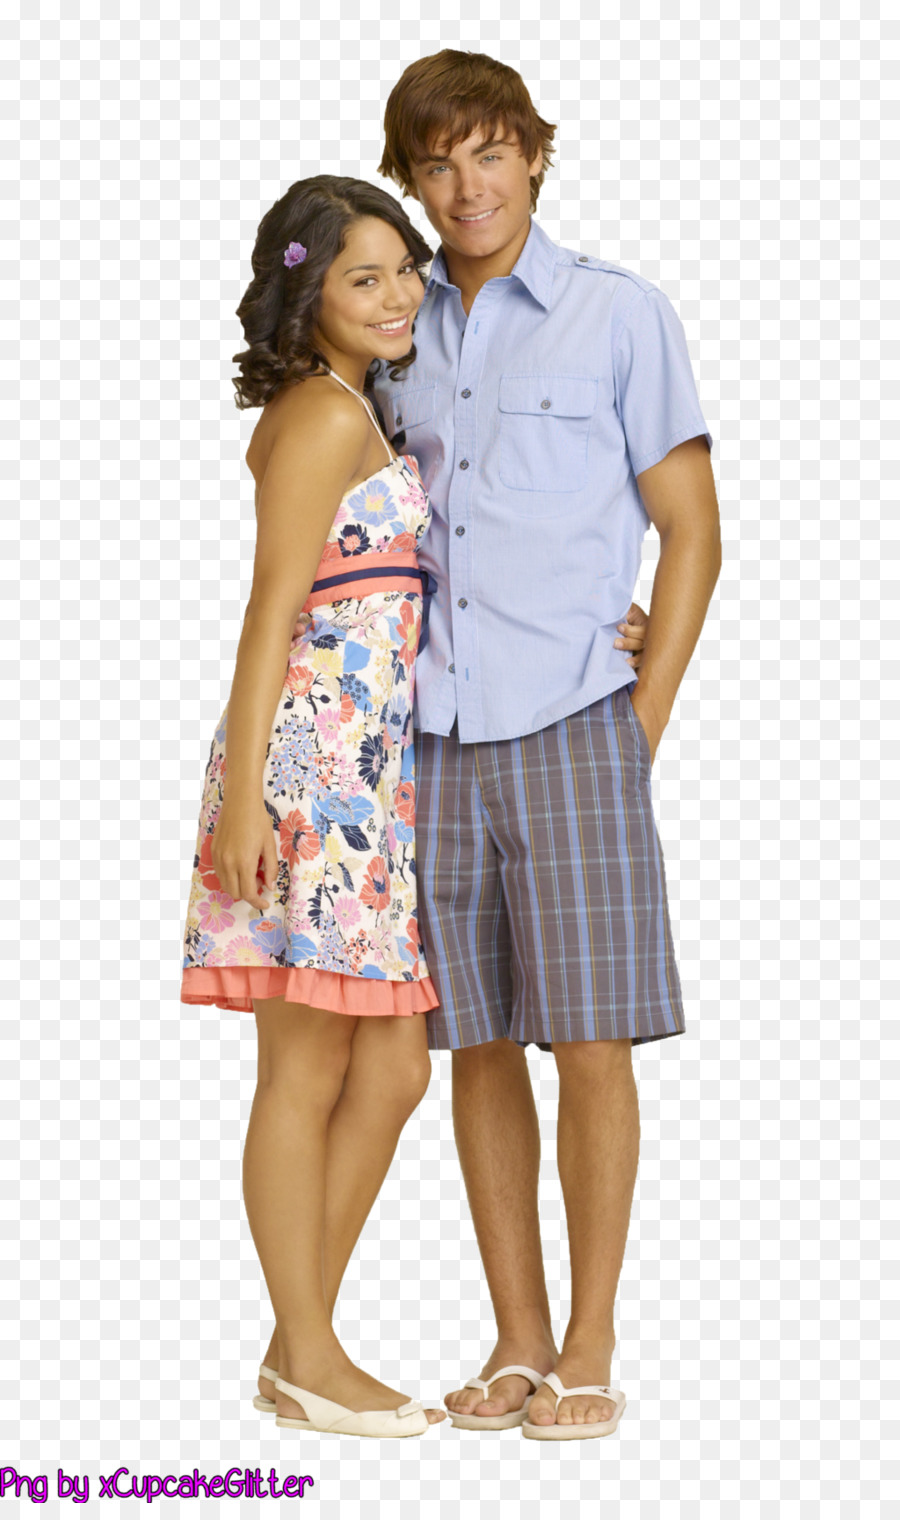 6b16c06235d Sharpay Evans Gabriella Montez High School Musical  The Concert ...